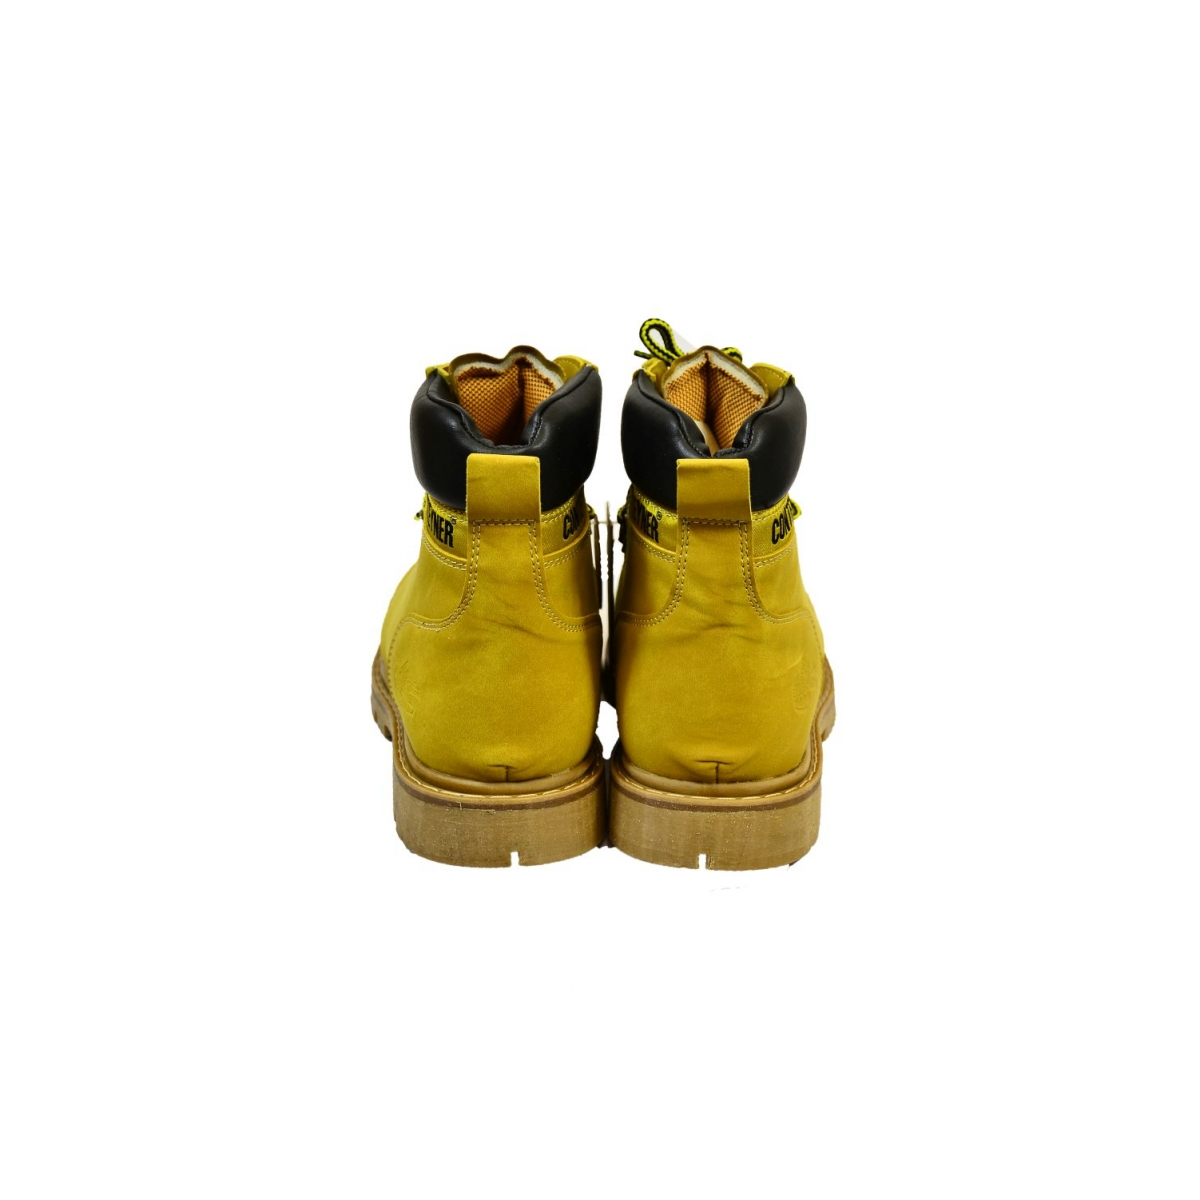 b7d7fc2a57 Pánske topánky RIDIK - 3